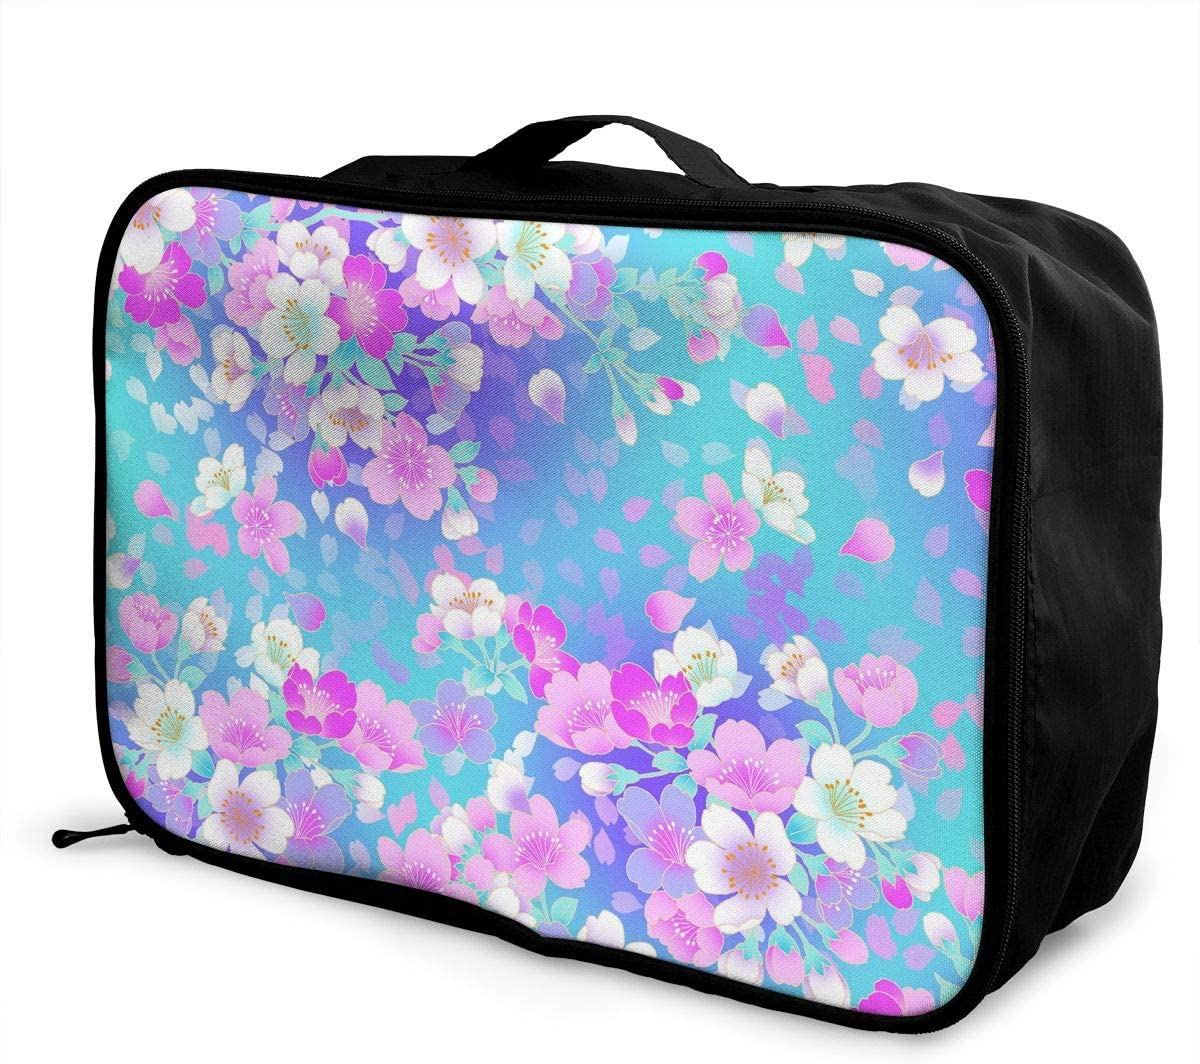 Travel Luggage Duffle Bag Lightweight Portable Handbag Cool Modern Pattern Large Capacity Waterproof Foldable Storage Tote